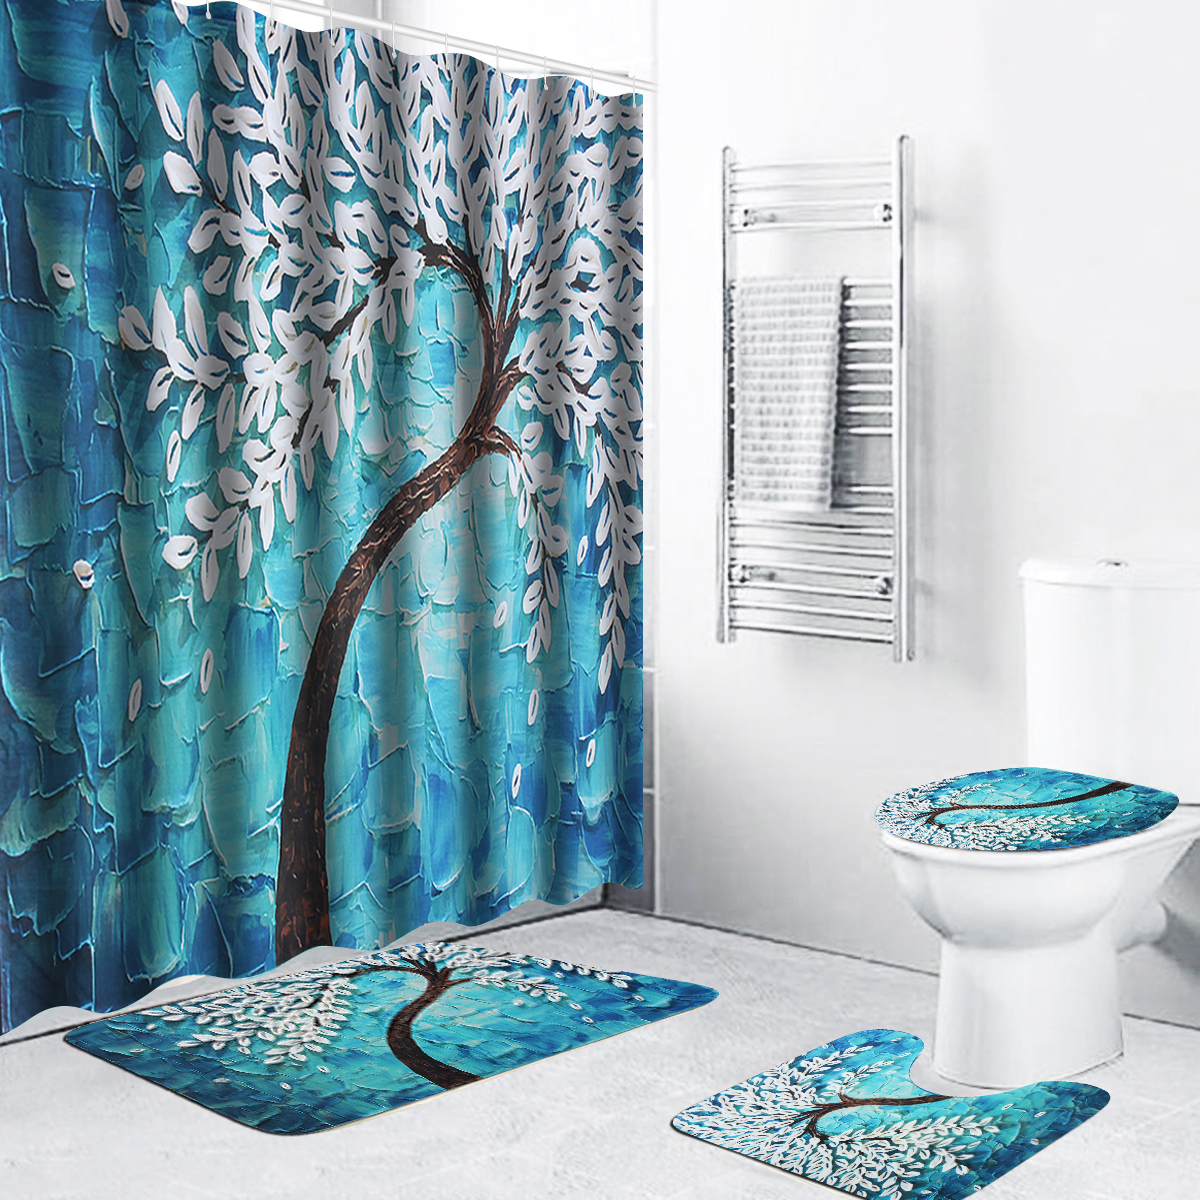 washable anti slip bathroom sets 4 pieces non slip soft absorbent flower tree shower curtain bath mat pedestal mat toilet seat cover mat blue